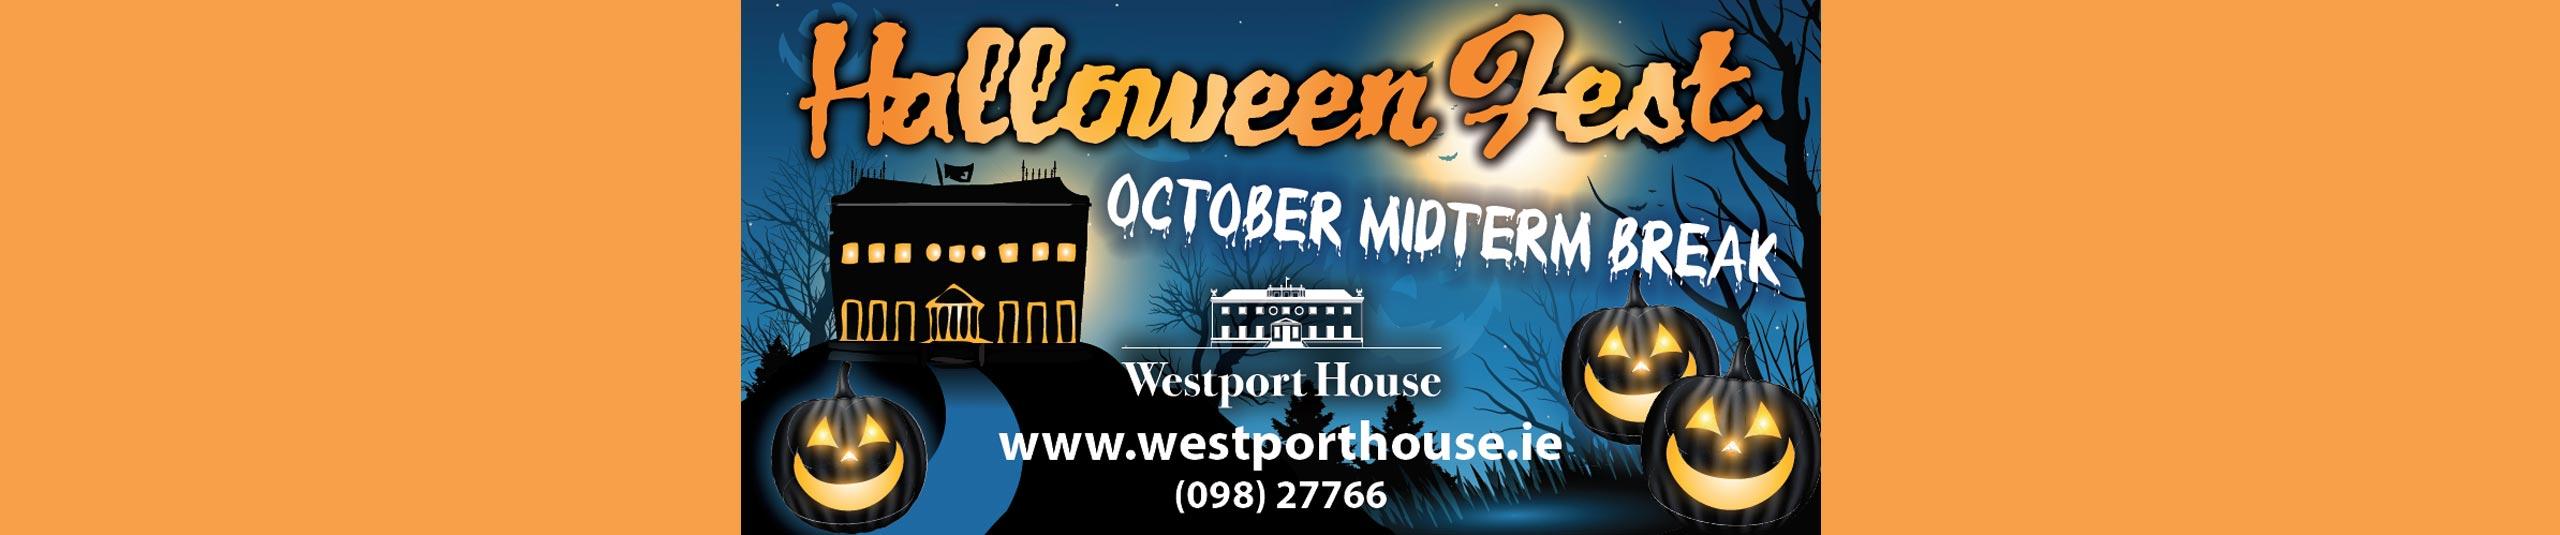 Westport swingers westport Dating, westport Personals, westport Singles, westport - Page 1